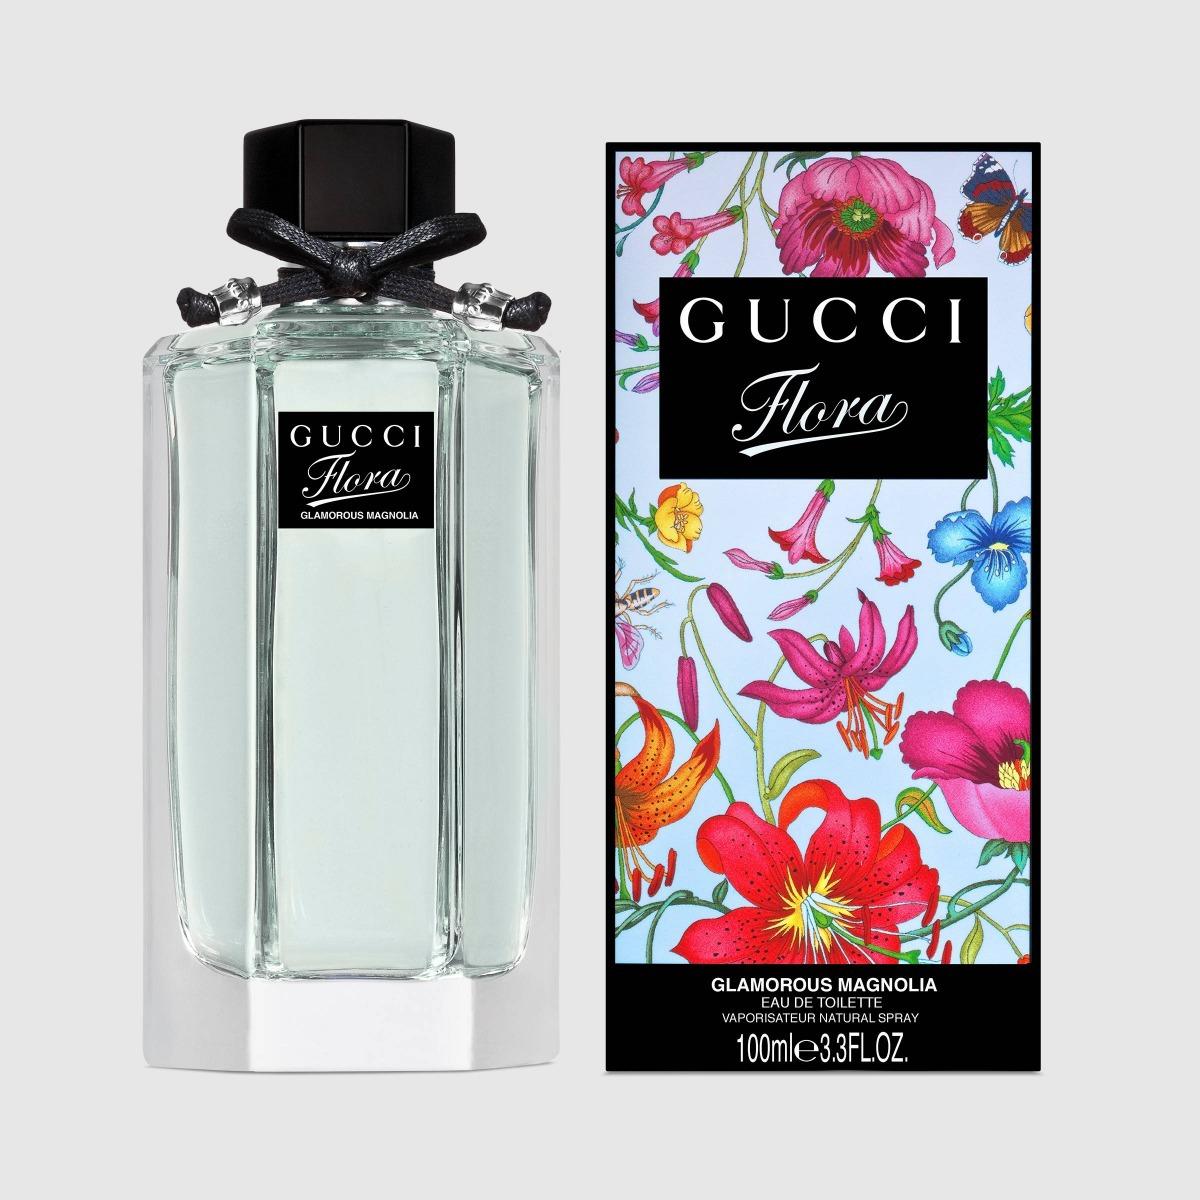 71412f0ed Perfume Flora By Gucci Glamorous Magnolia Feminino Edt 100m - R$ 419 ...